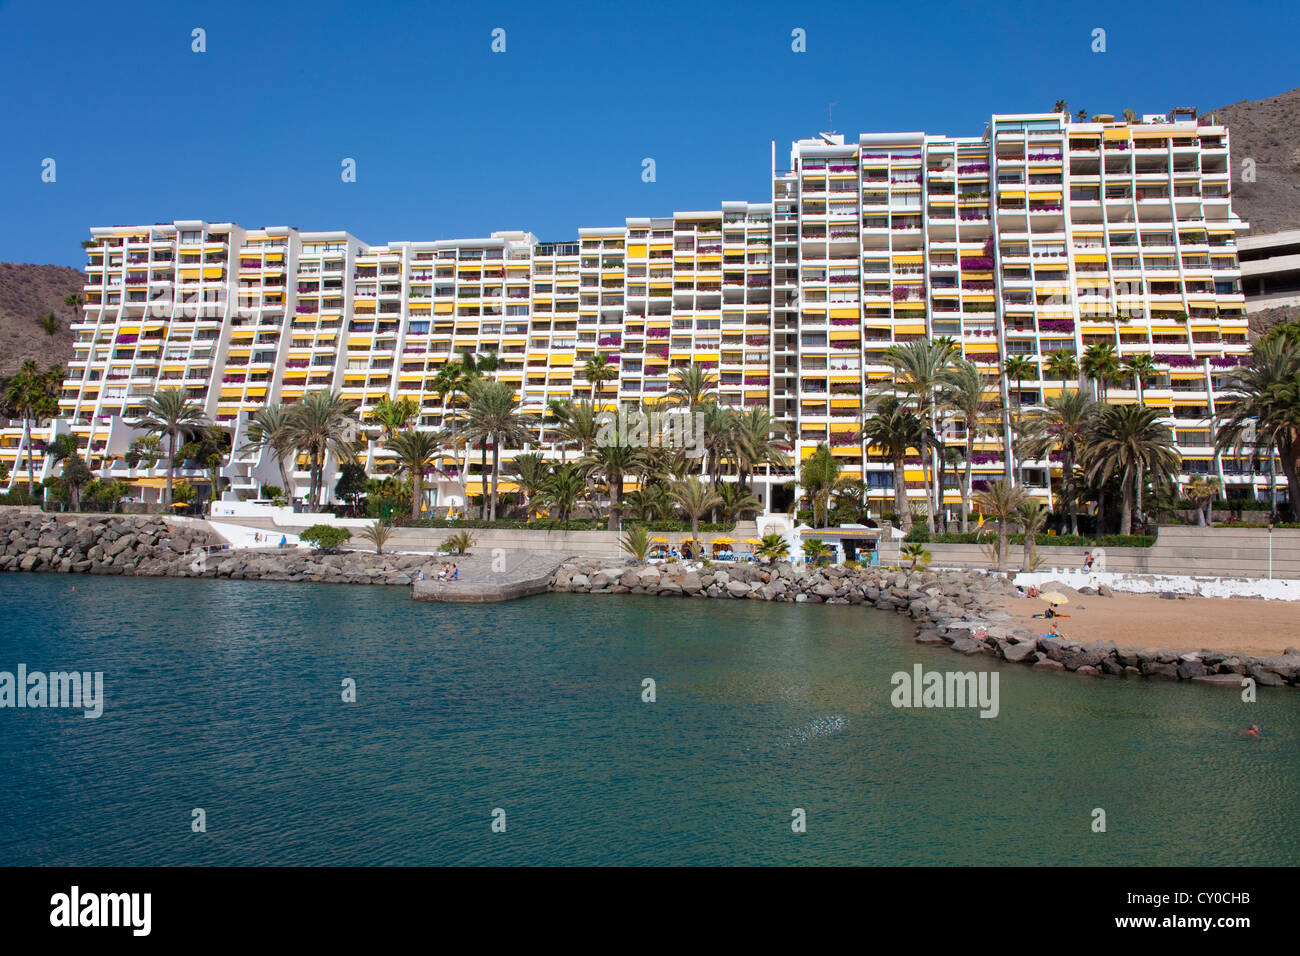 Hotel complex of Anfi del Mar, Arguineguin, Gran Canaria, Canary Islands, Spain, Europe, Atlantic Ocean - Stock Image